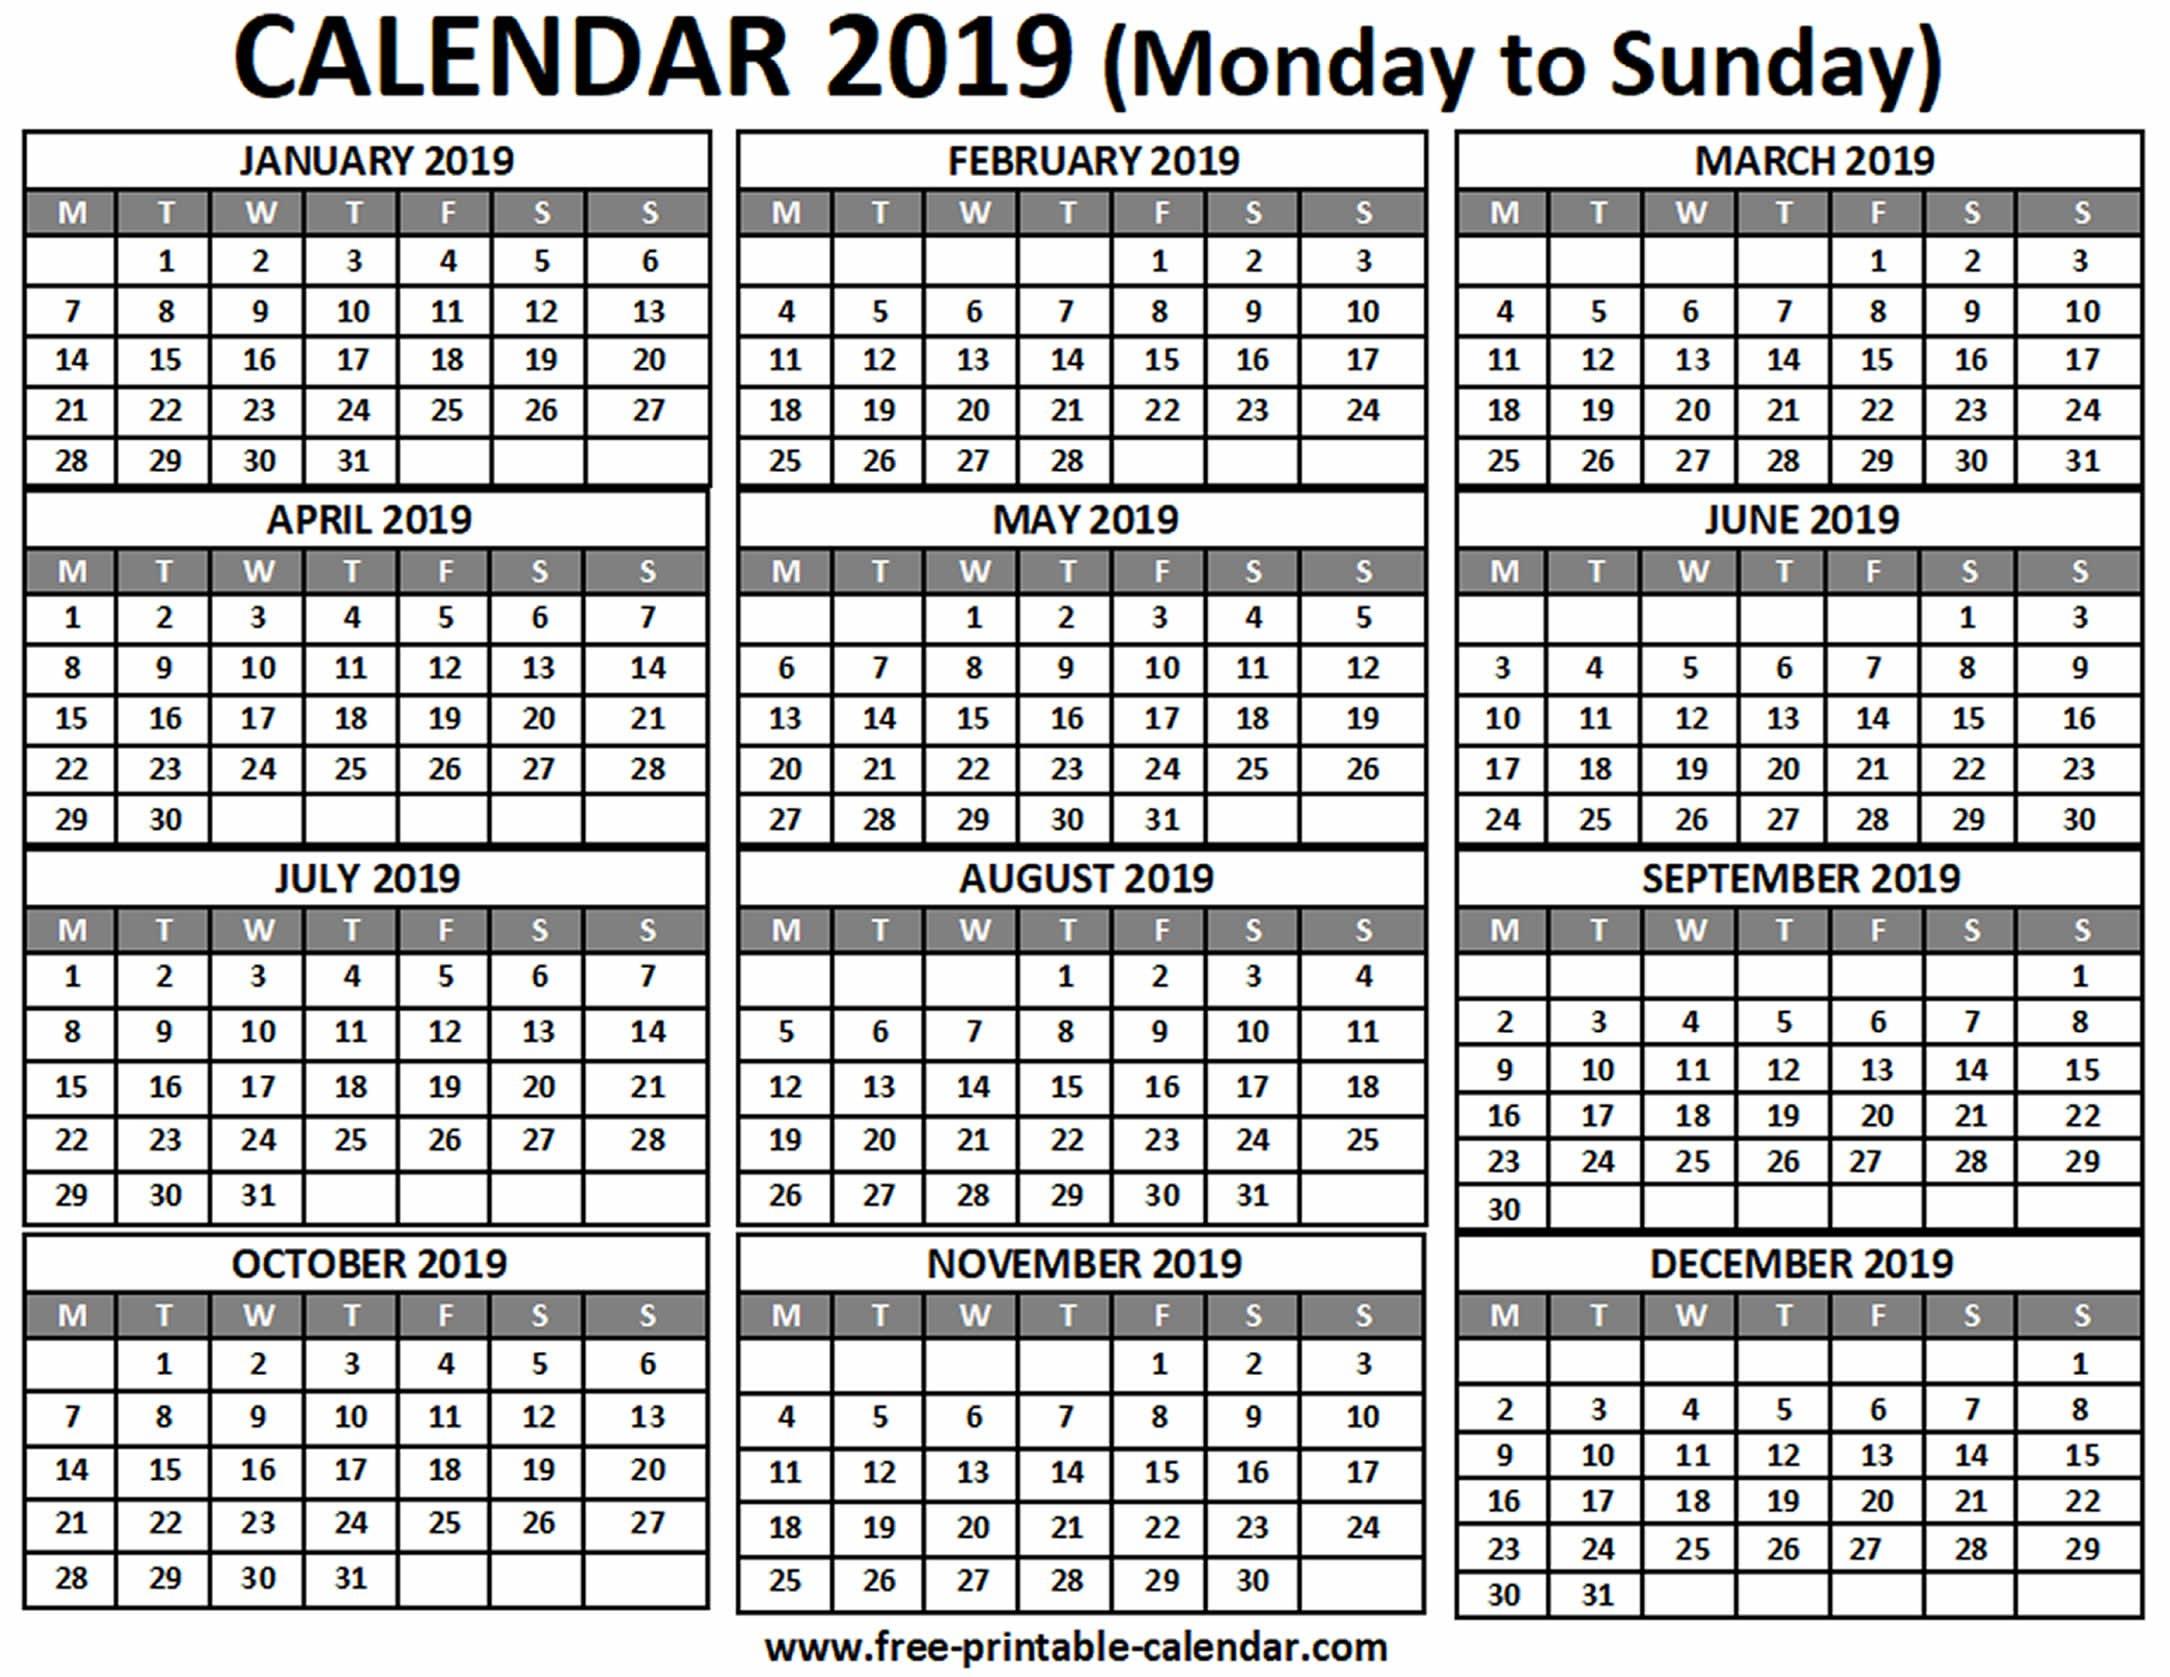 2019 Calendar - Free-Printable-Calendar Term 1 Calendar 2019